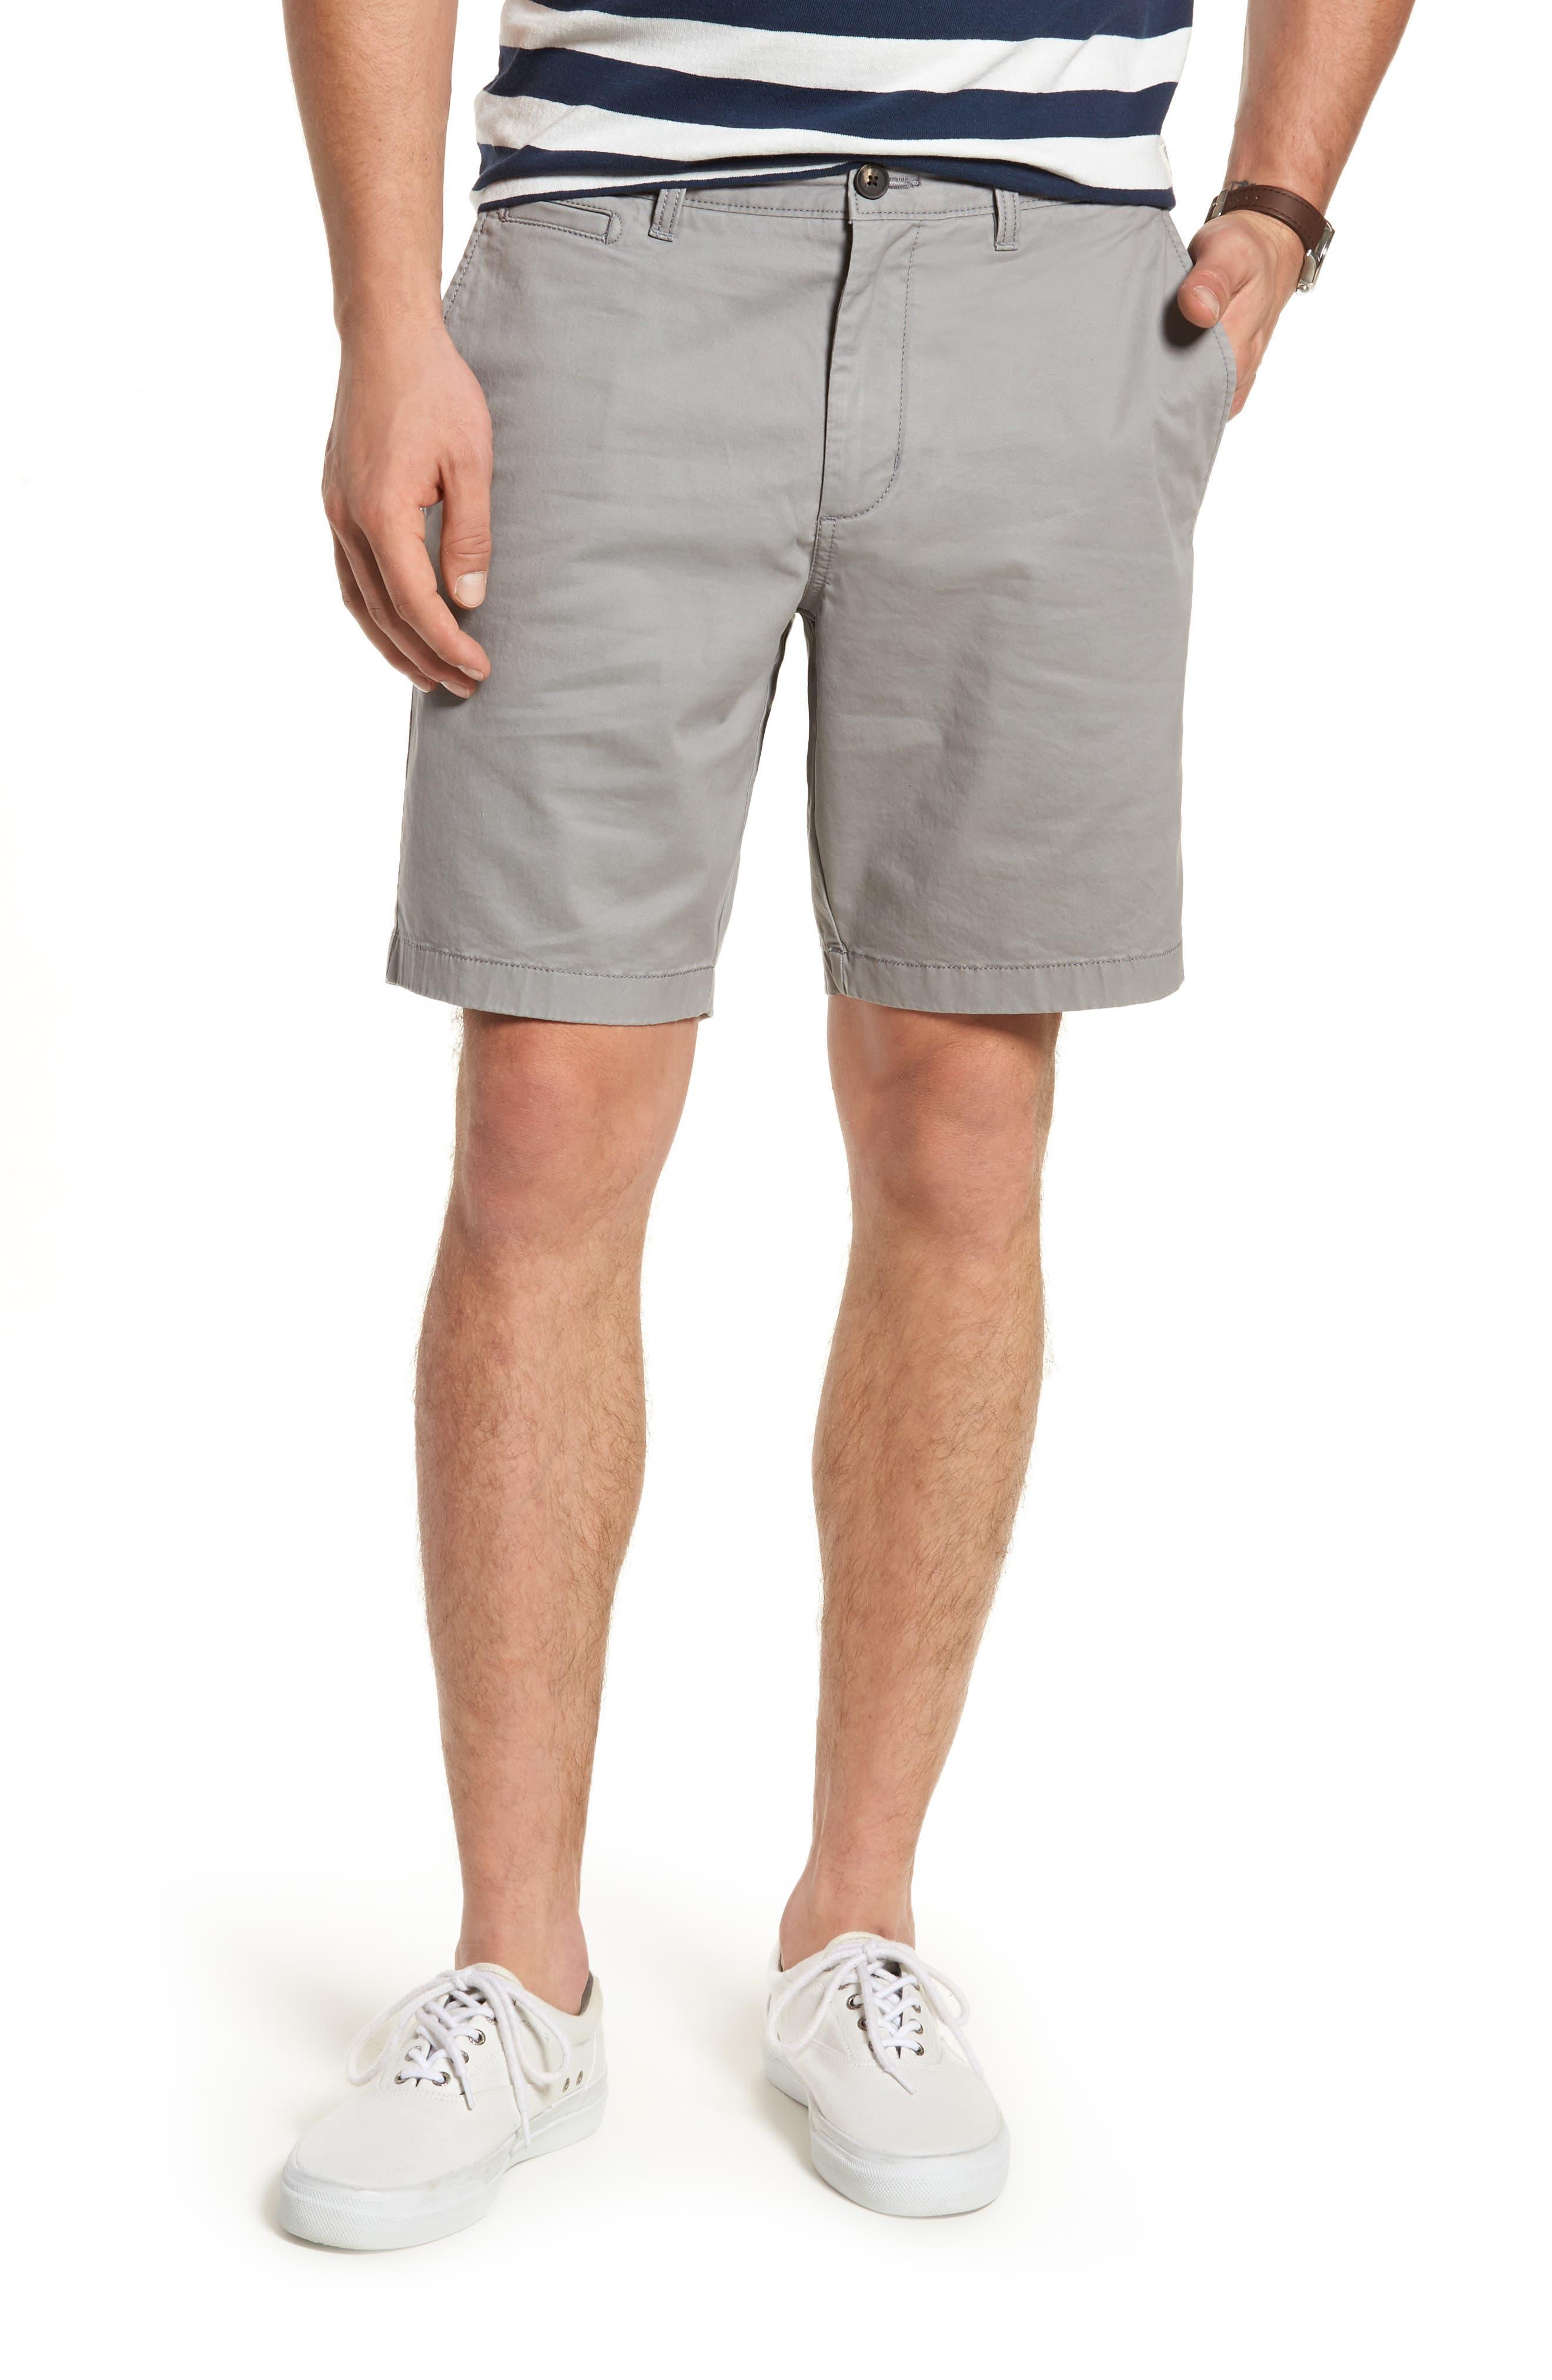 Ballard Slim Fit Stretch Chino 9-Inch Shorts,                             Main thumbnail 1, color,                             030